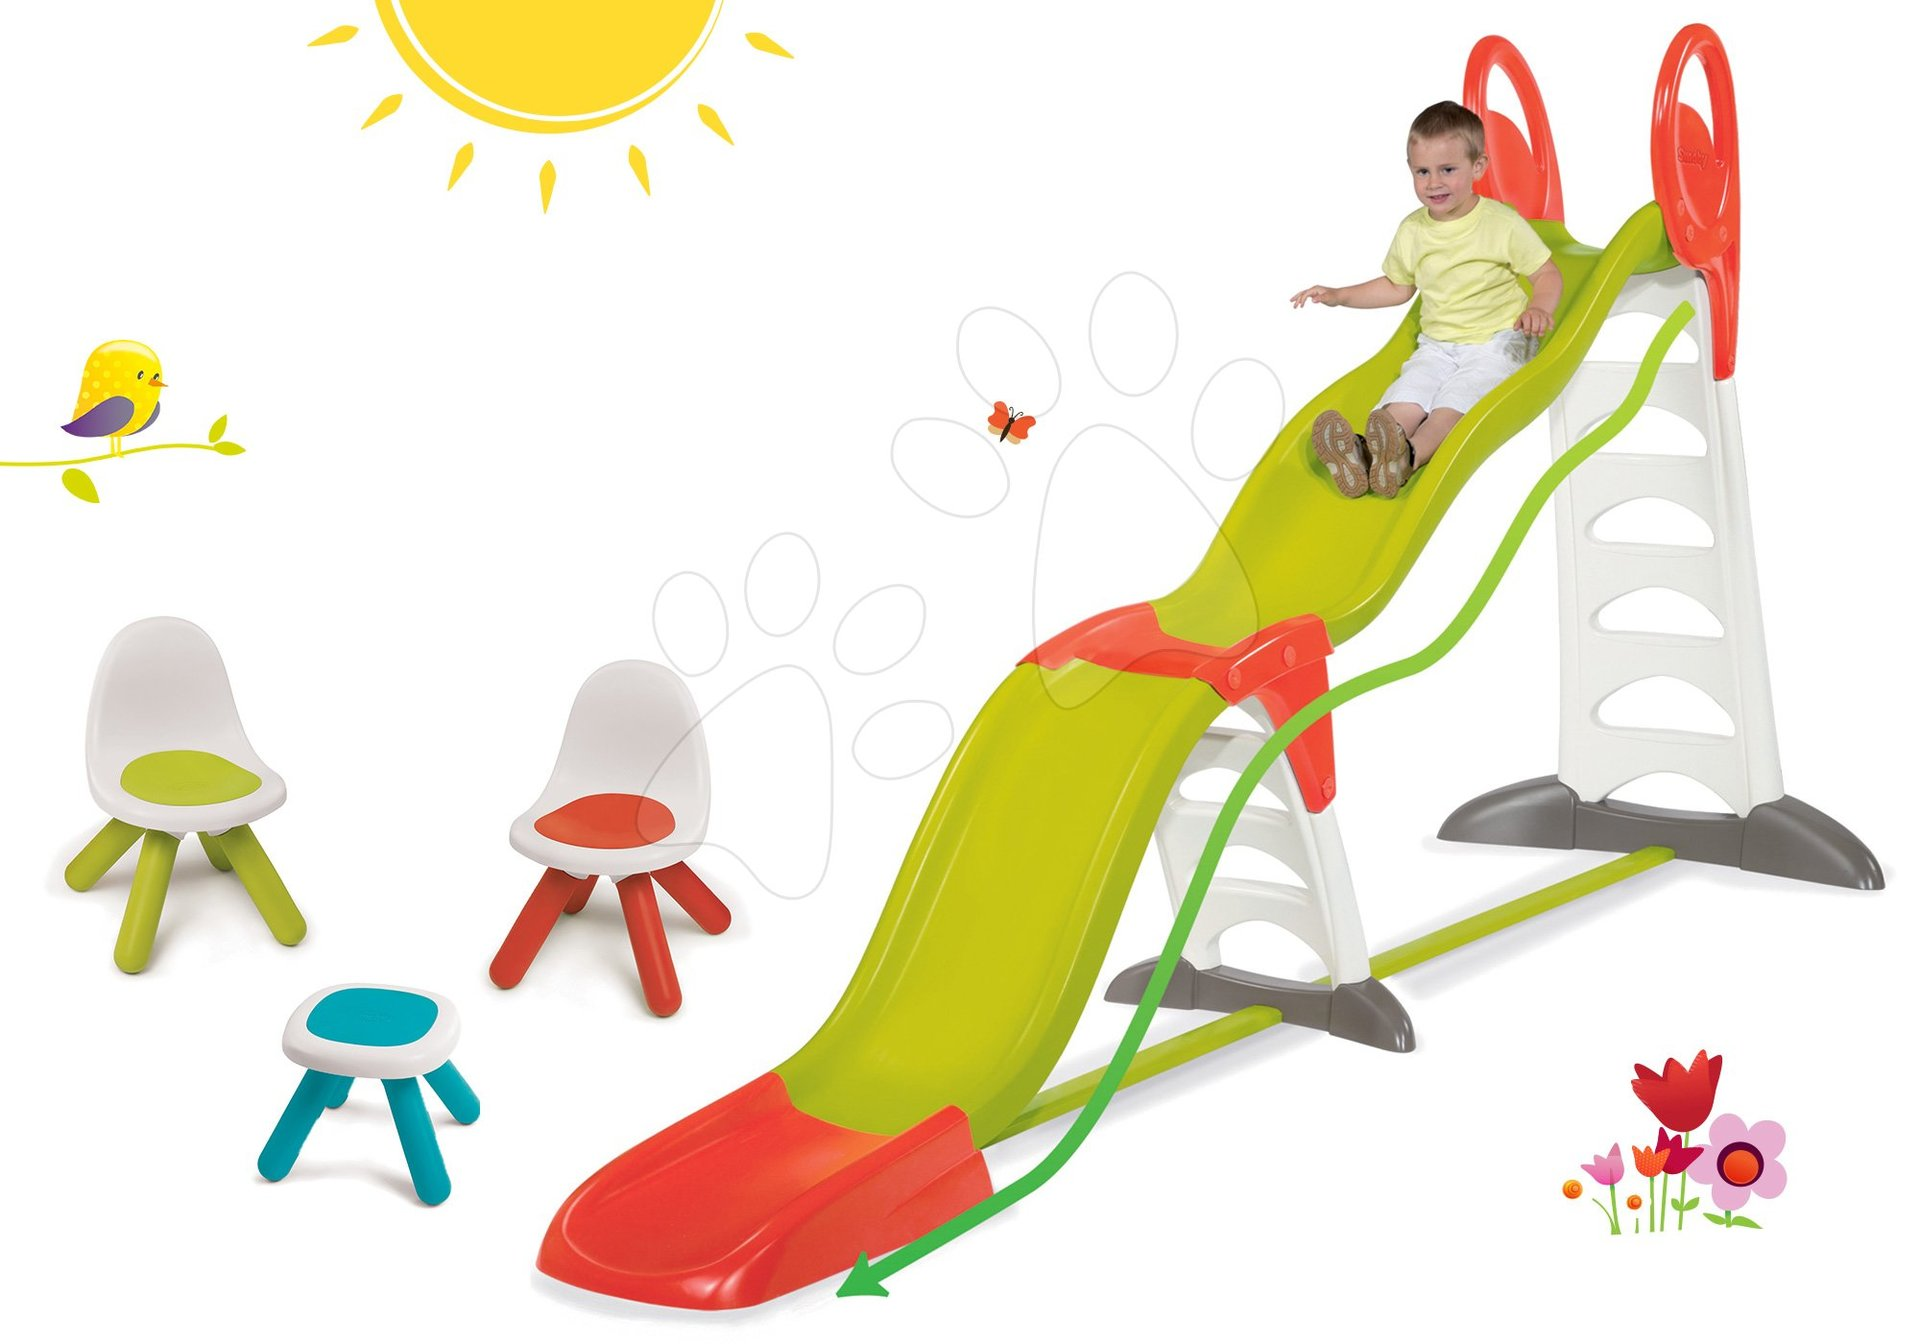 Šmykľavky sety - Set šmykľavka Toboggan Super Megagliss 2v1 Smoby dĺžka 3,75/1,5 m a Piknik stolík s dvoma stoličkami KidChair od 24 mes